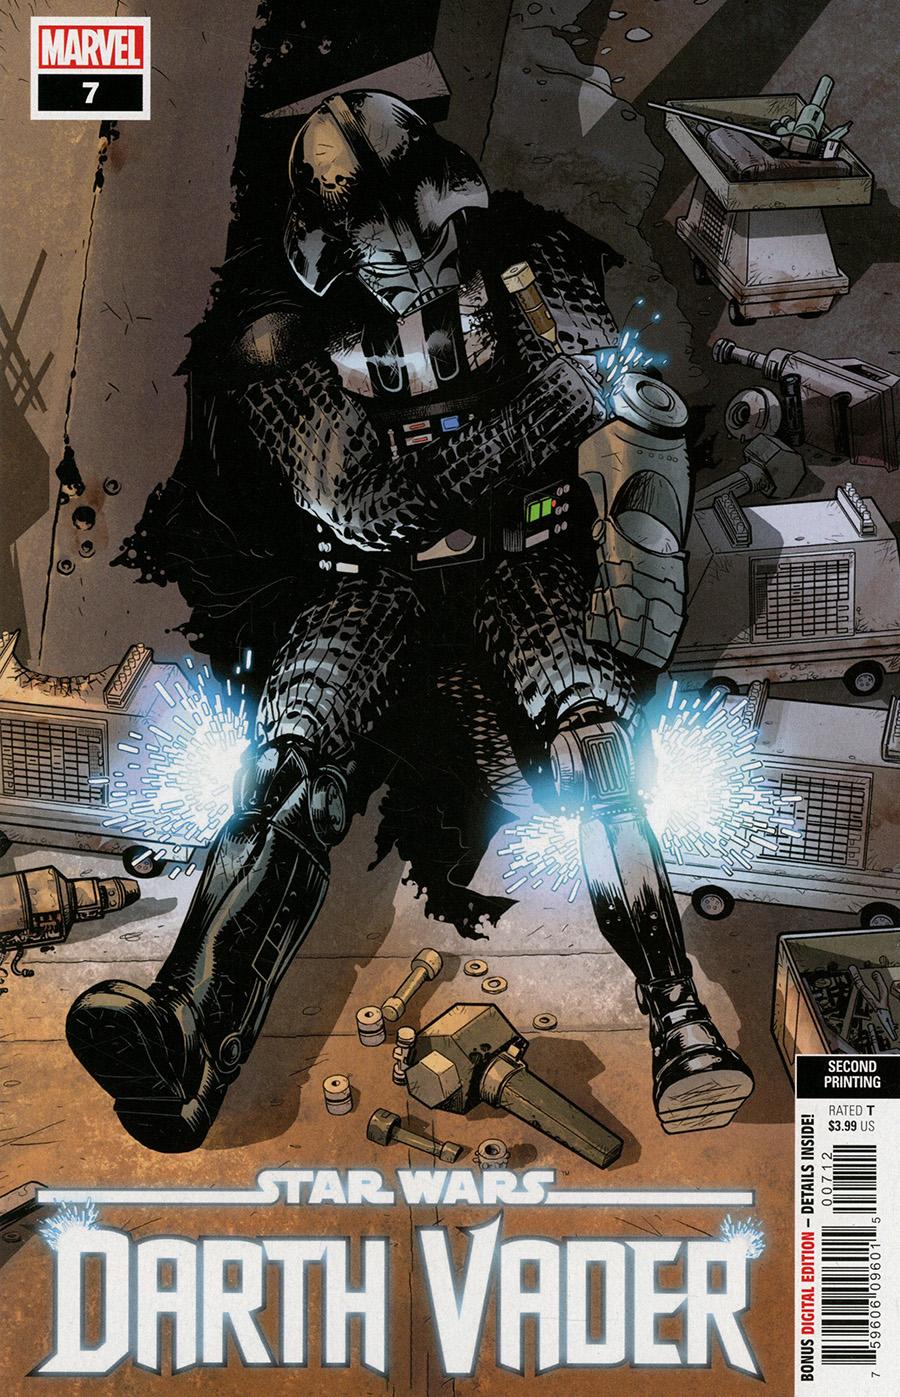 Star Wars Darth Vader #7 Cover C 2nd Ptg Variant Cover